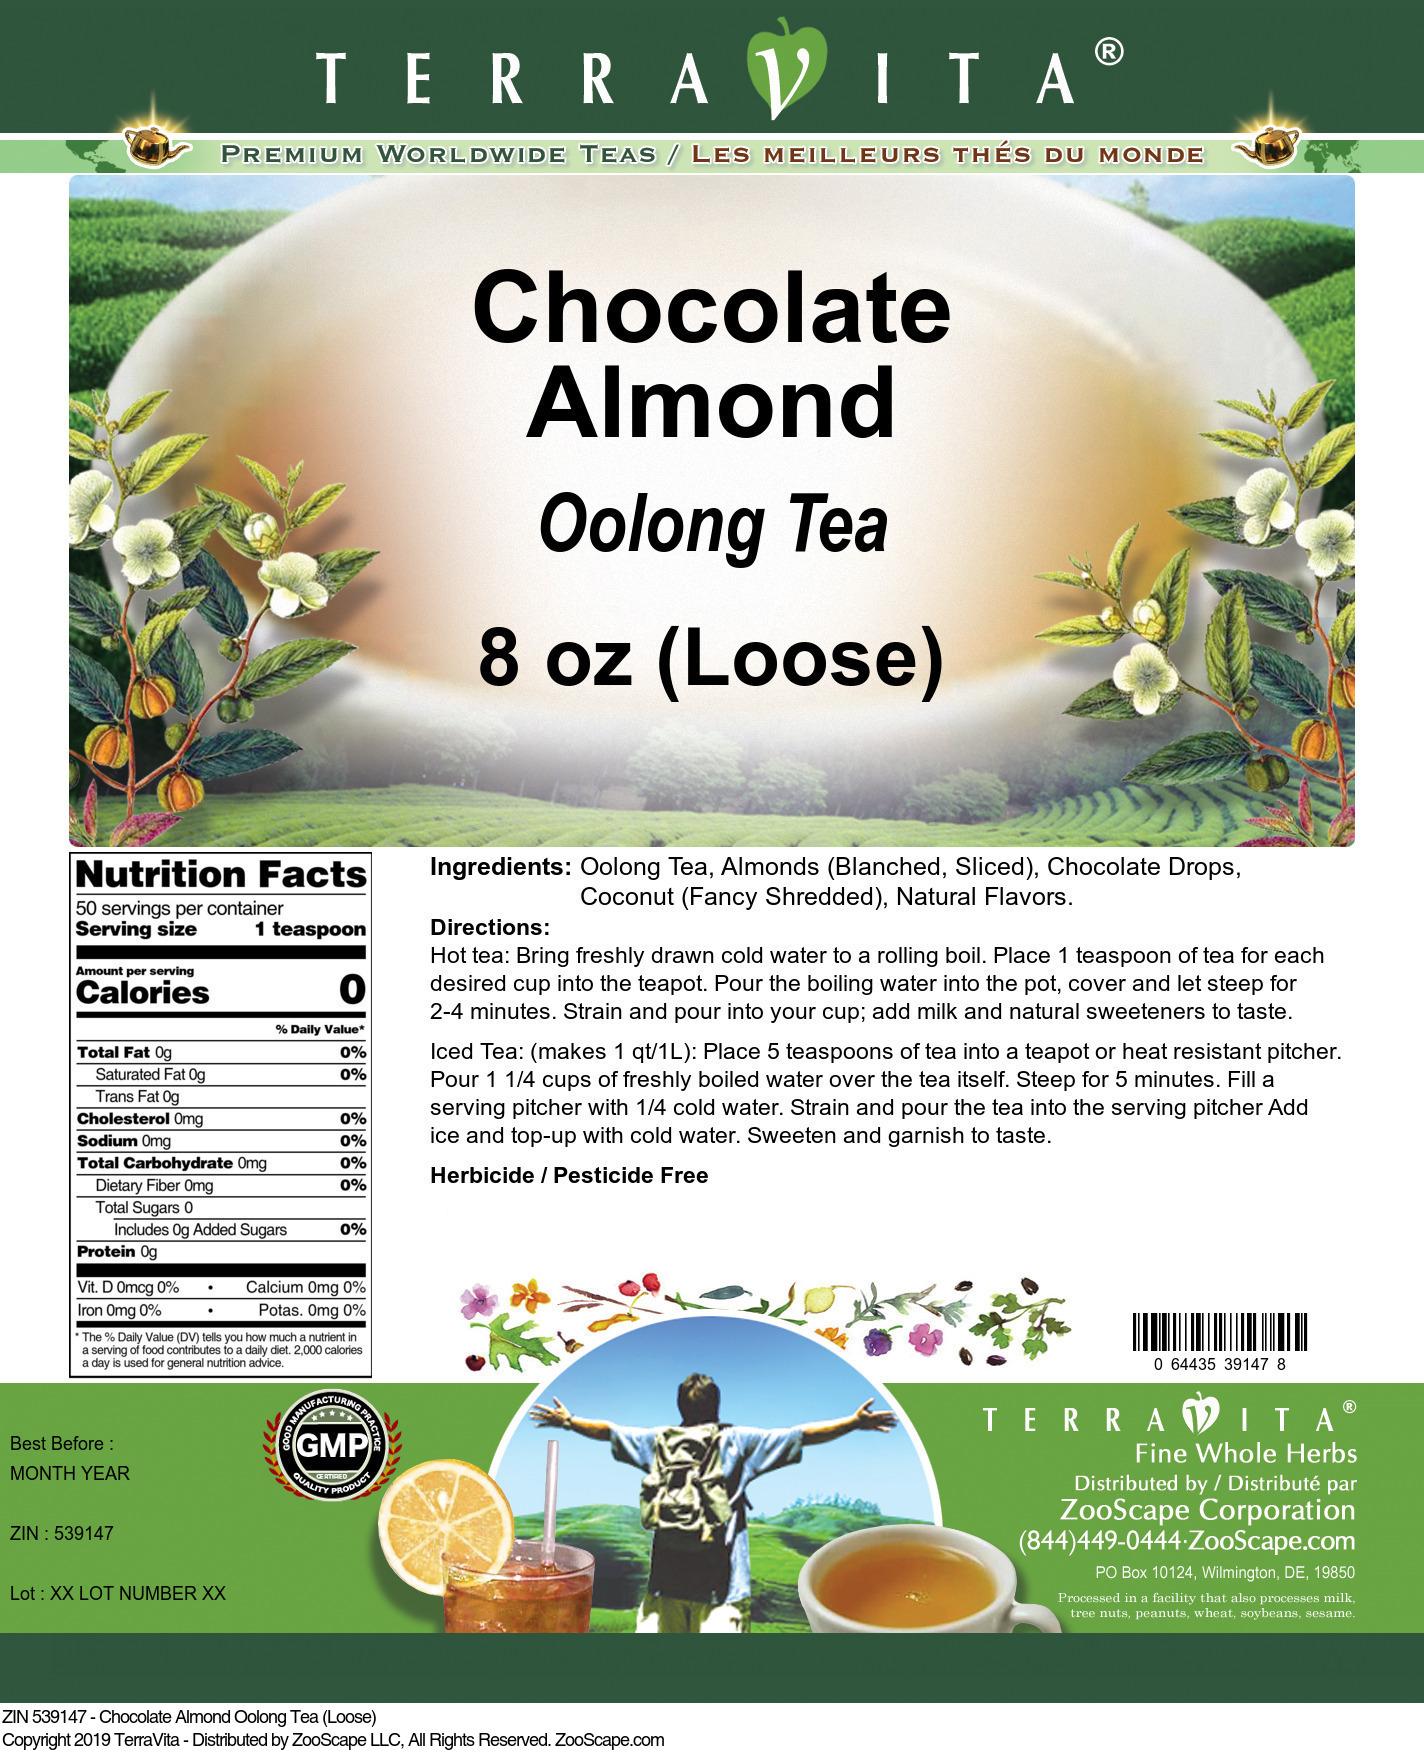 Chocolate Almond Oolong Tea (Loose)